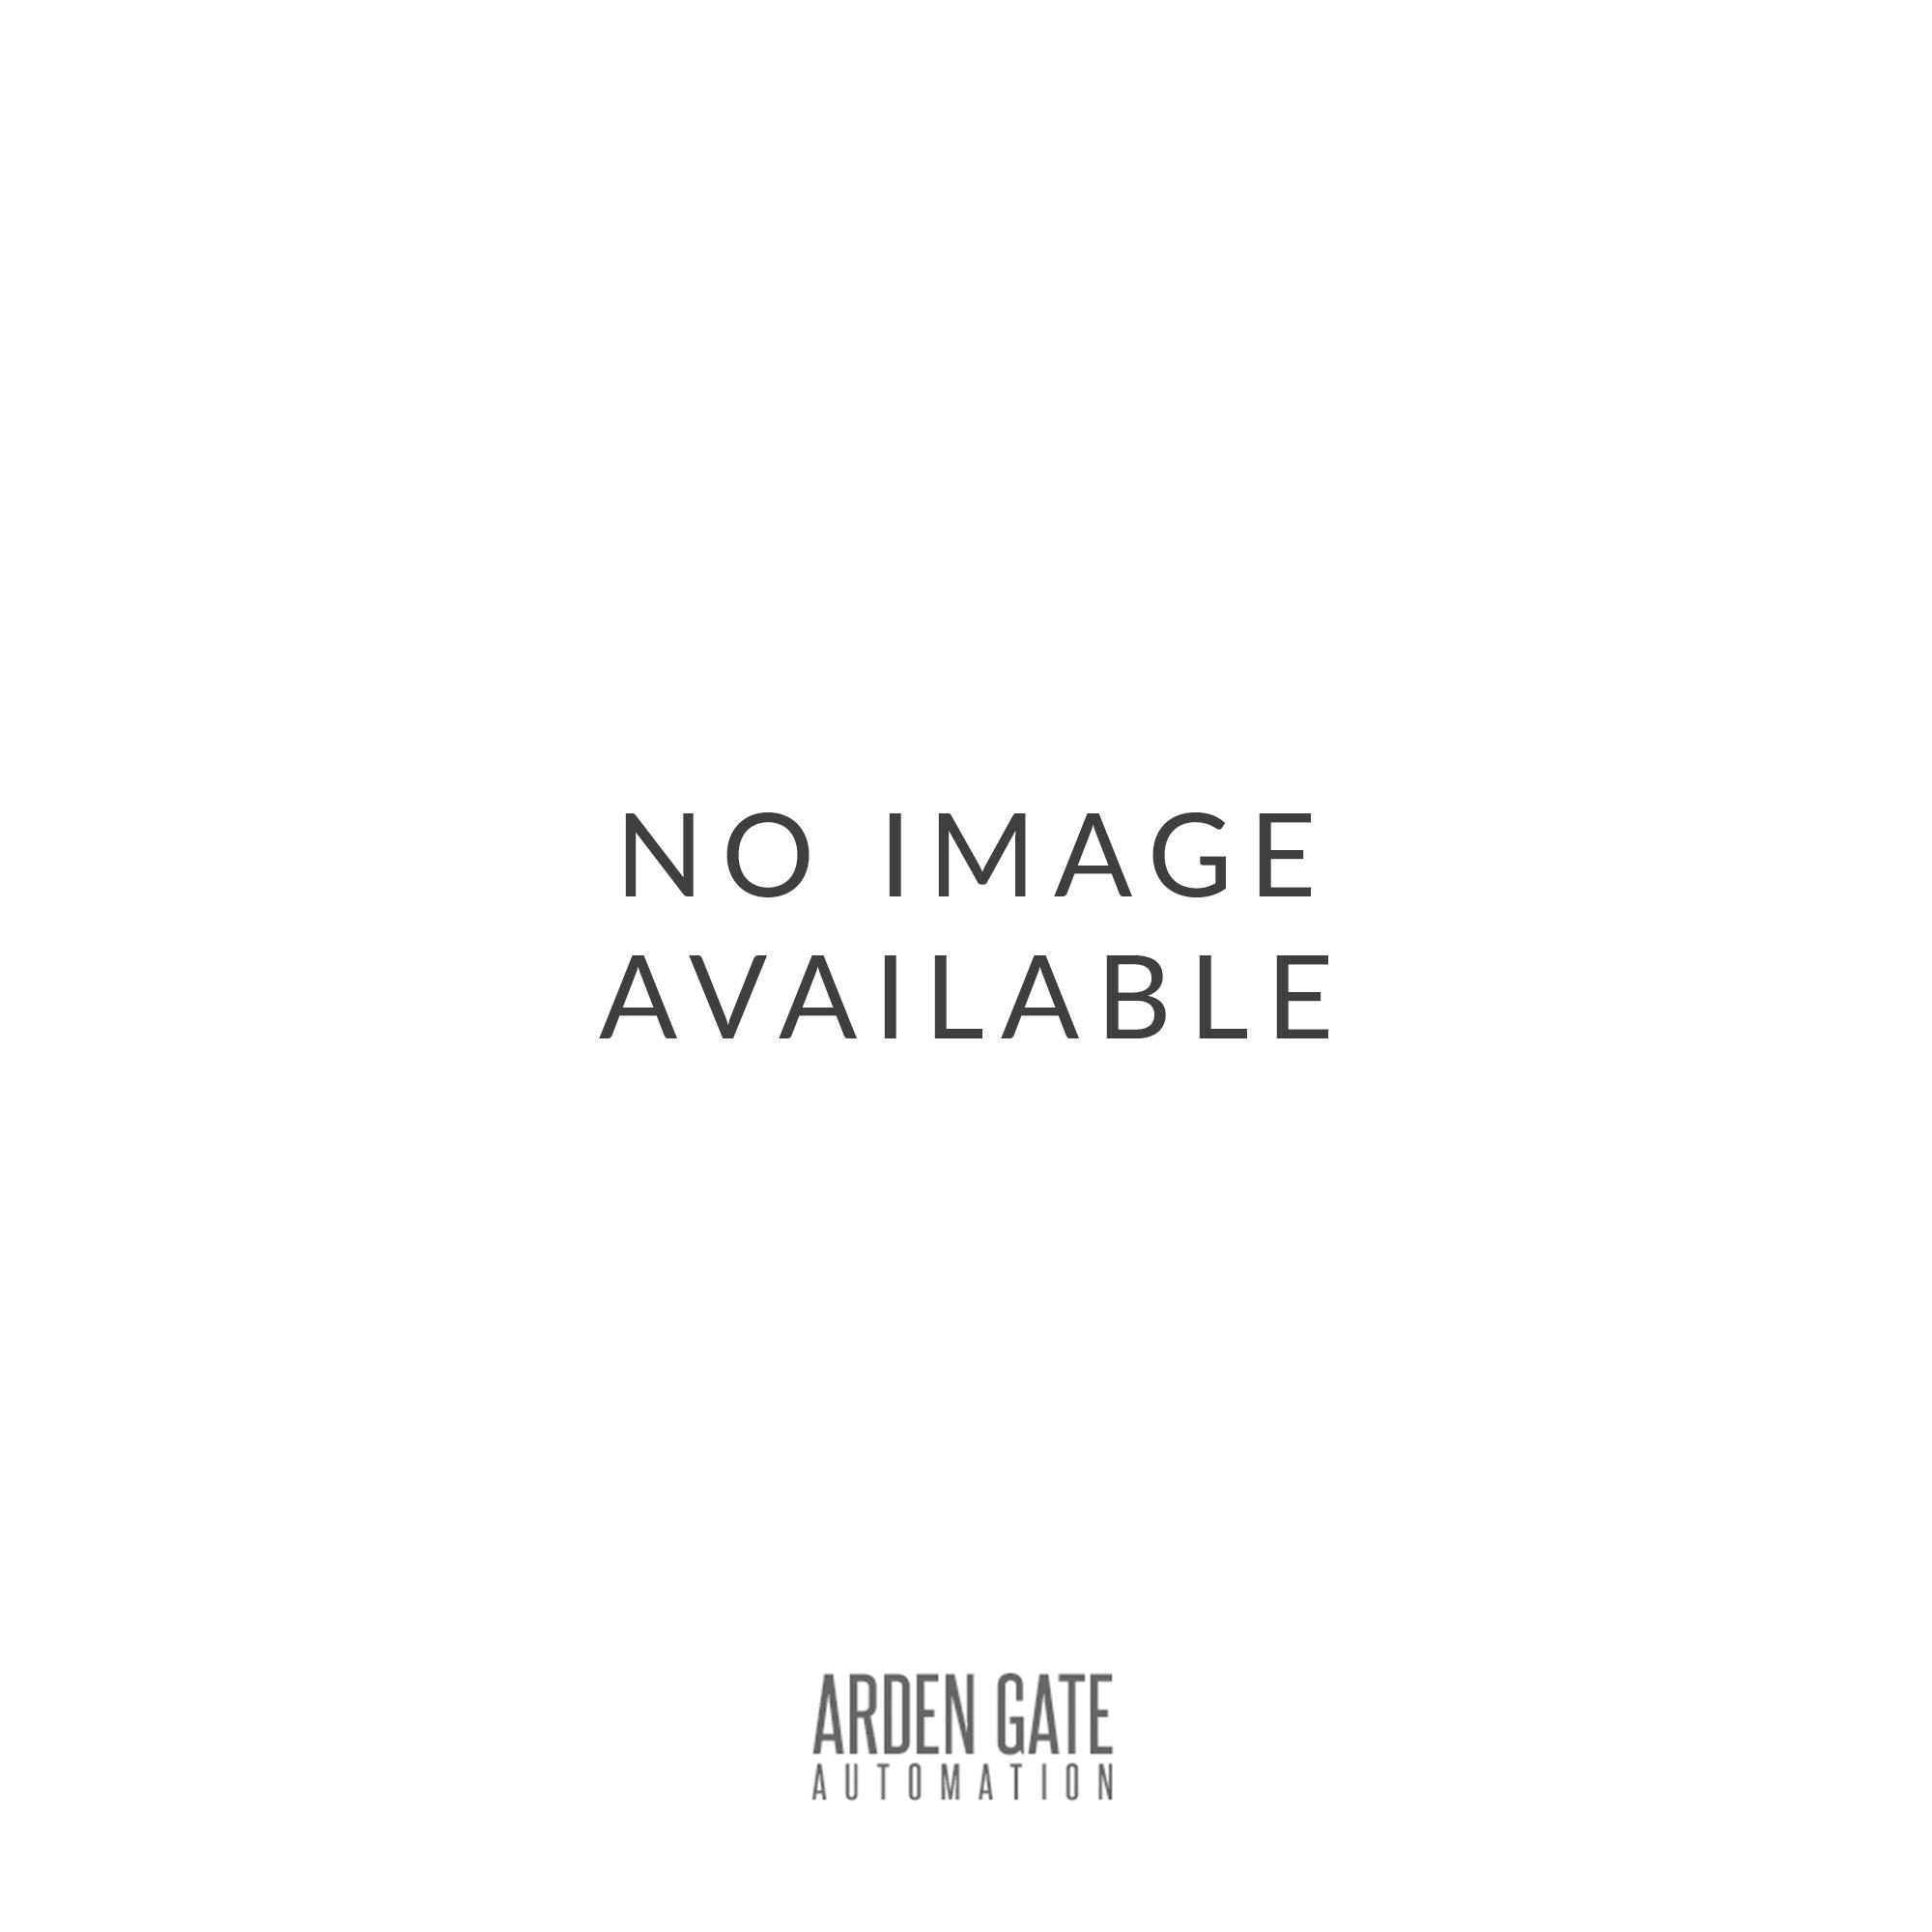 FAAC 413 UK KIT electro mechanical double operator kit for swing gates